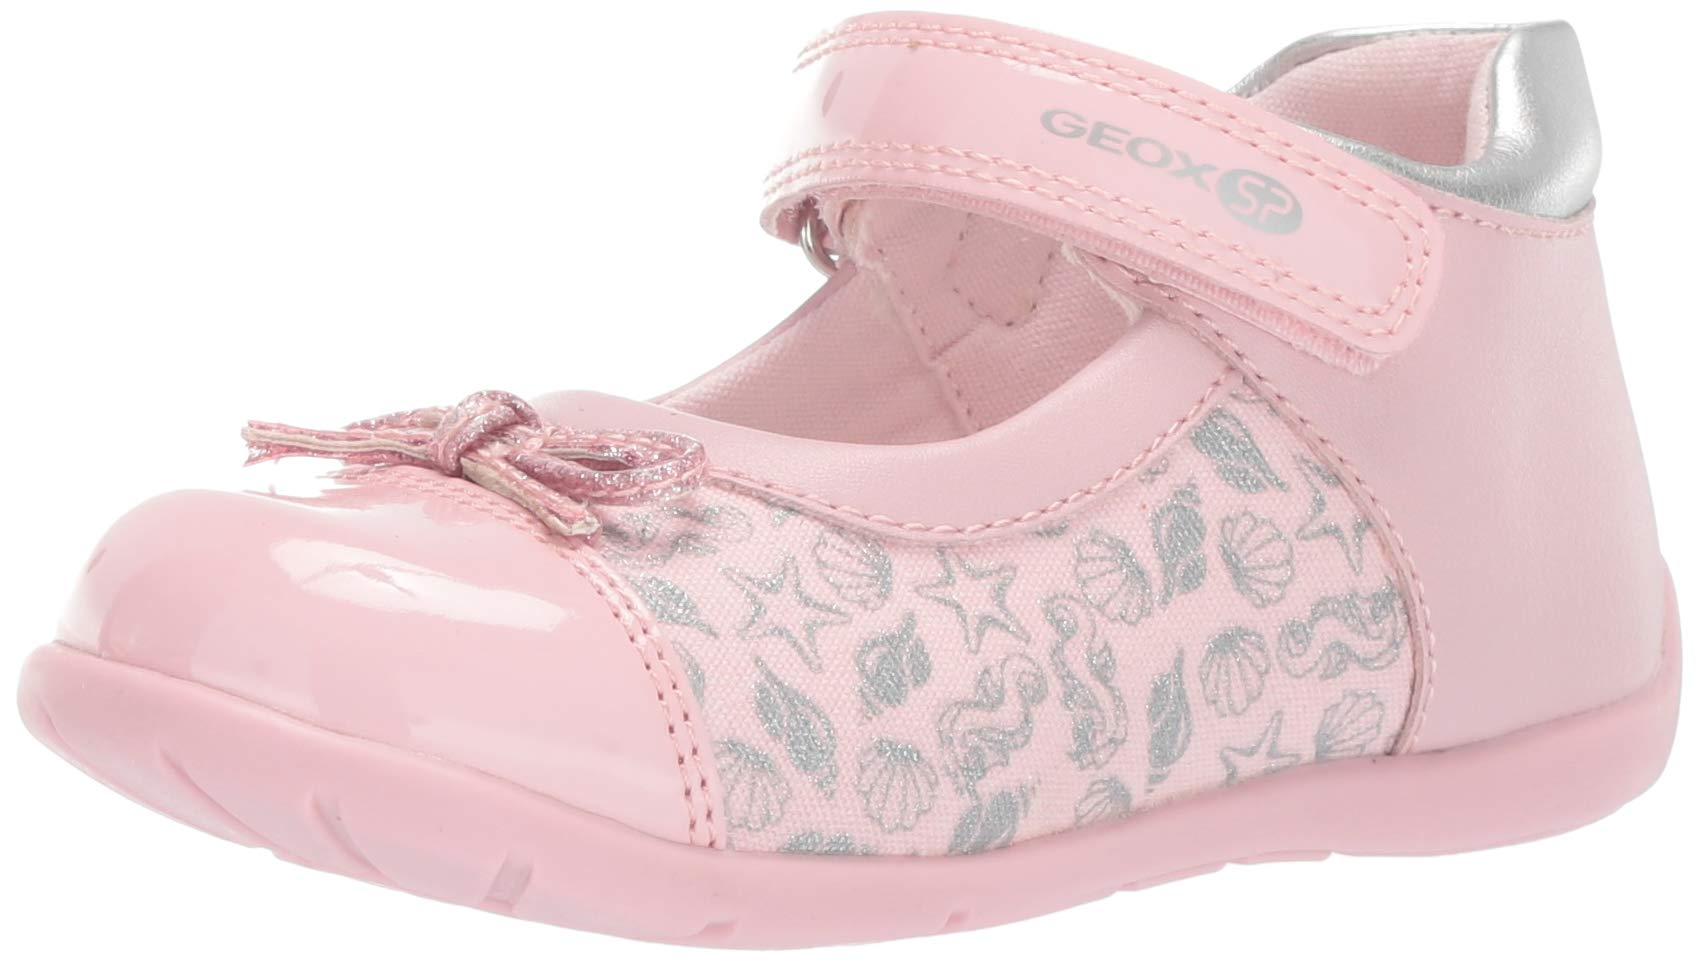 Geox Unisex-Child Elthan Girl 3 Velcro Ballet Flat Mary Jane